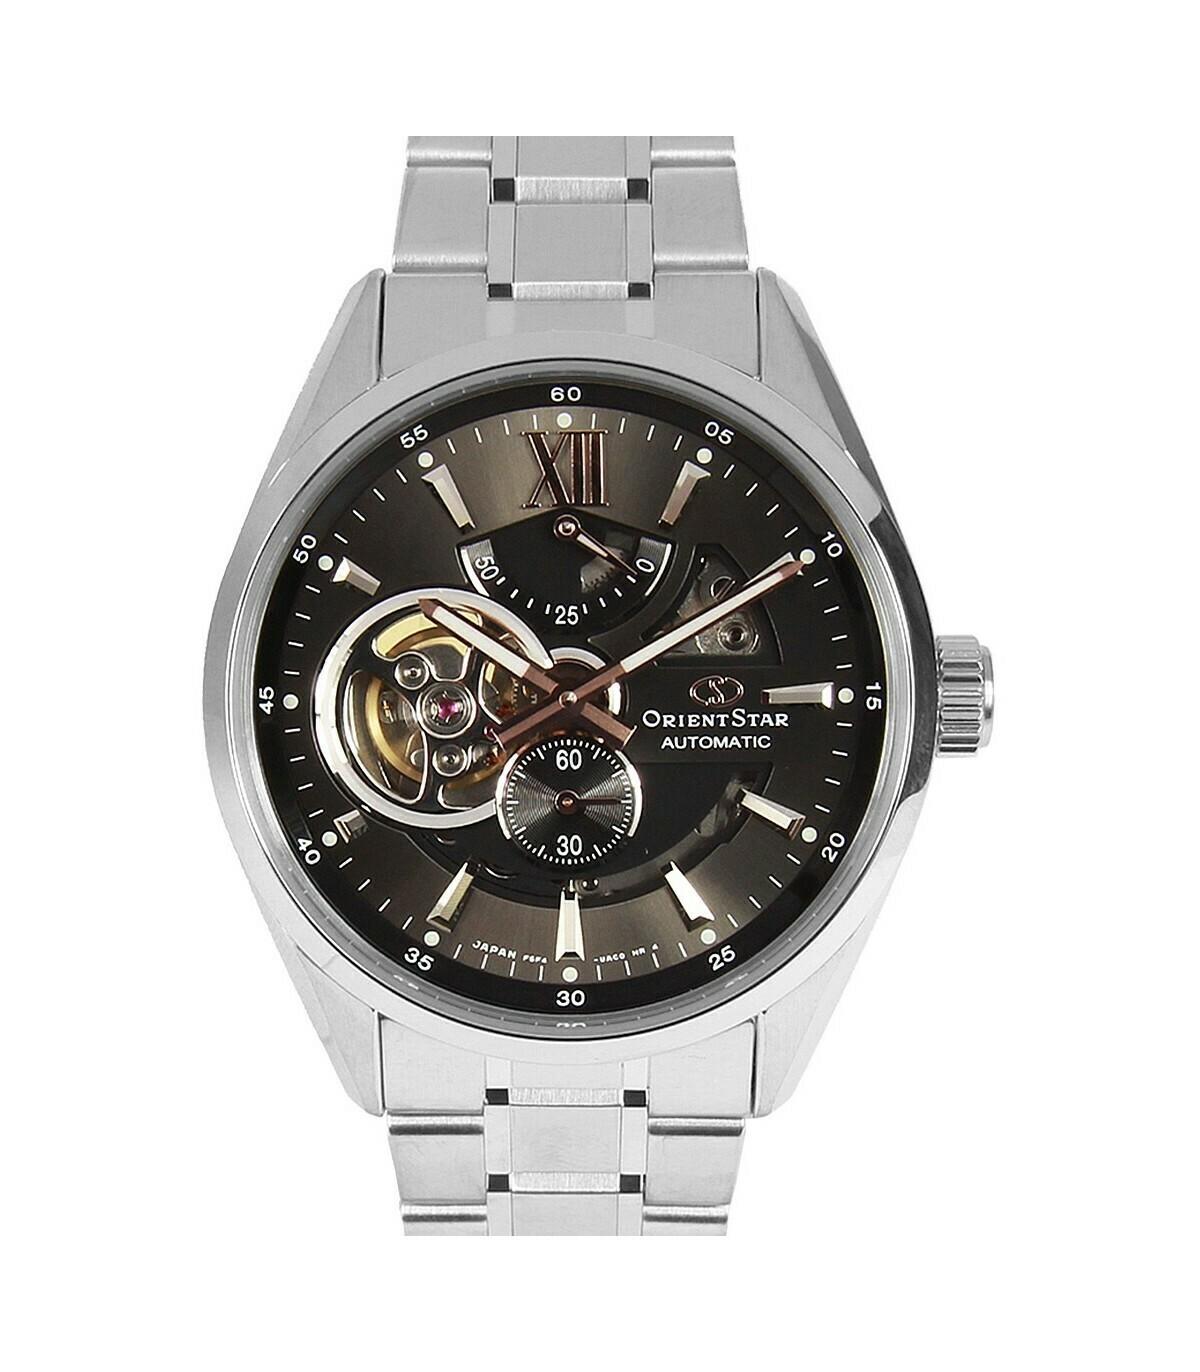 Reloj Automático Hombre Orient Star RE-AV0004N correa acero cristal zafiro